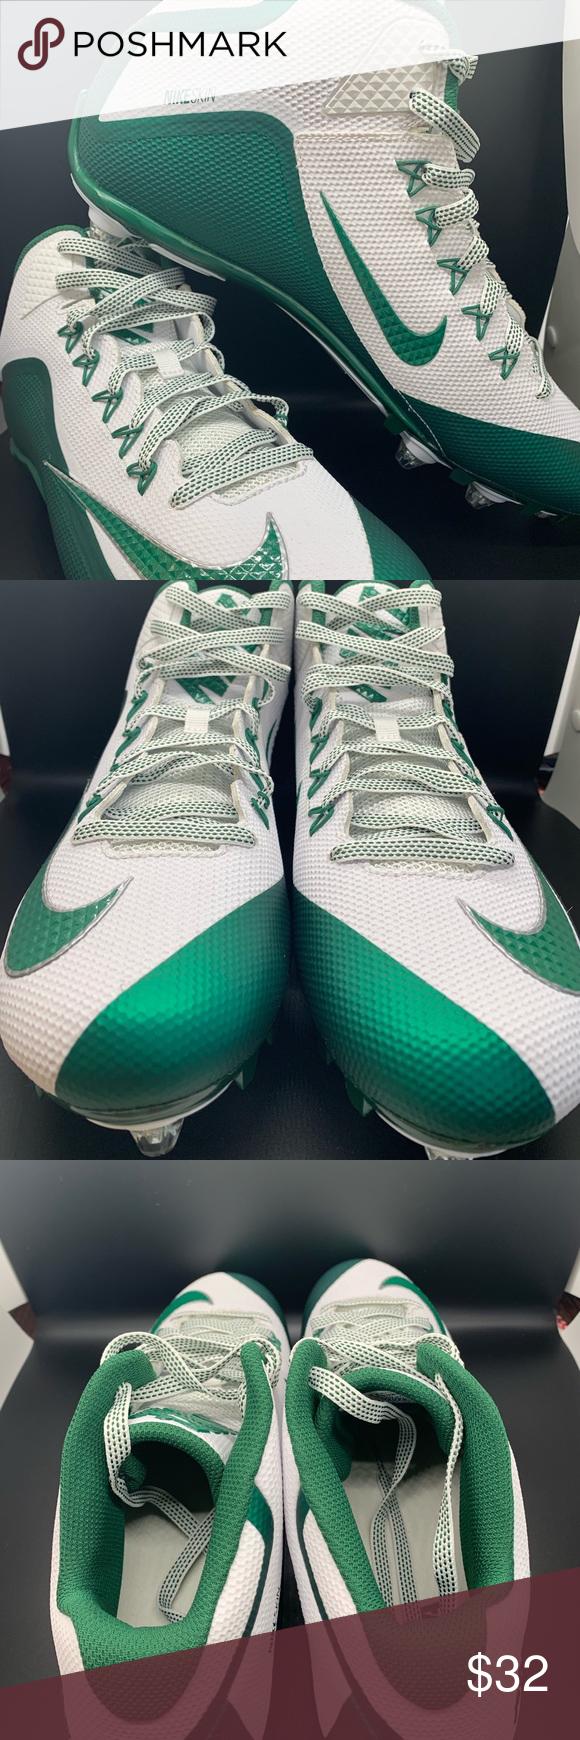 cacd7b54408f NWOB NIKE alpha pro td 2 Brand new no box. Nike alpha pro td 2. Nike Shoes  Athletic Shoes